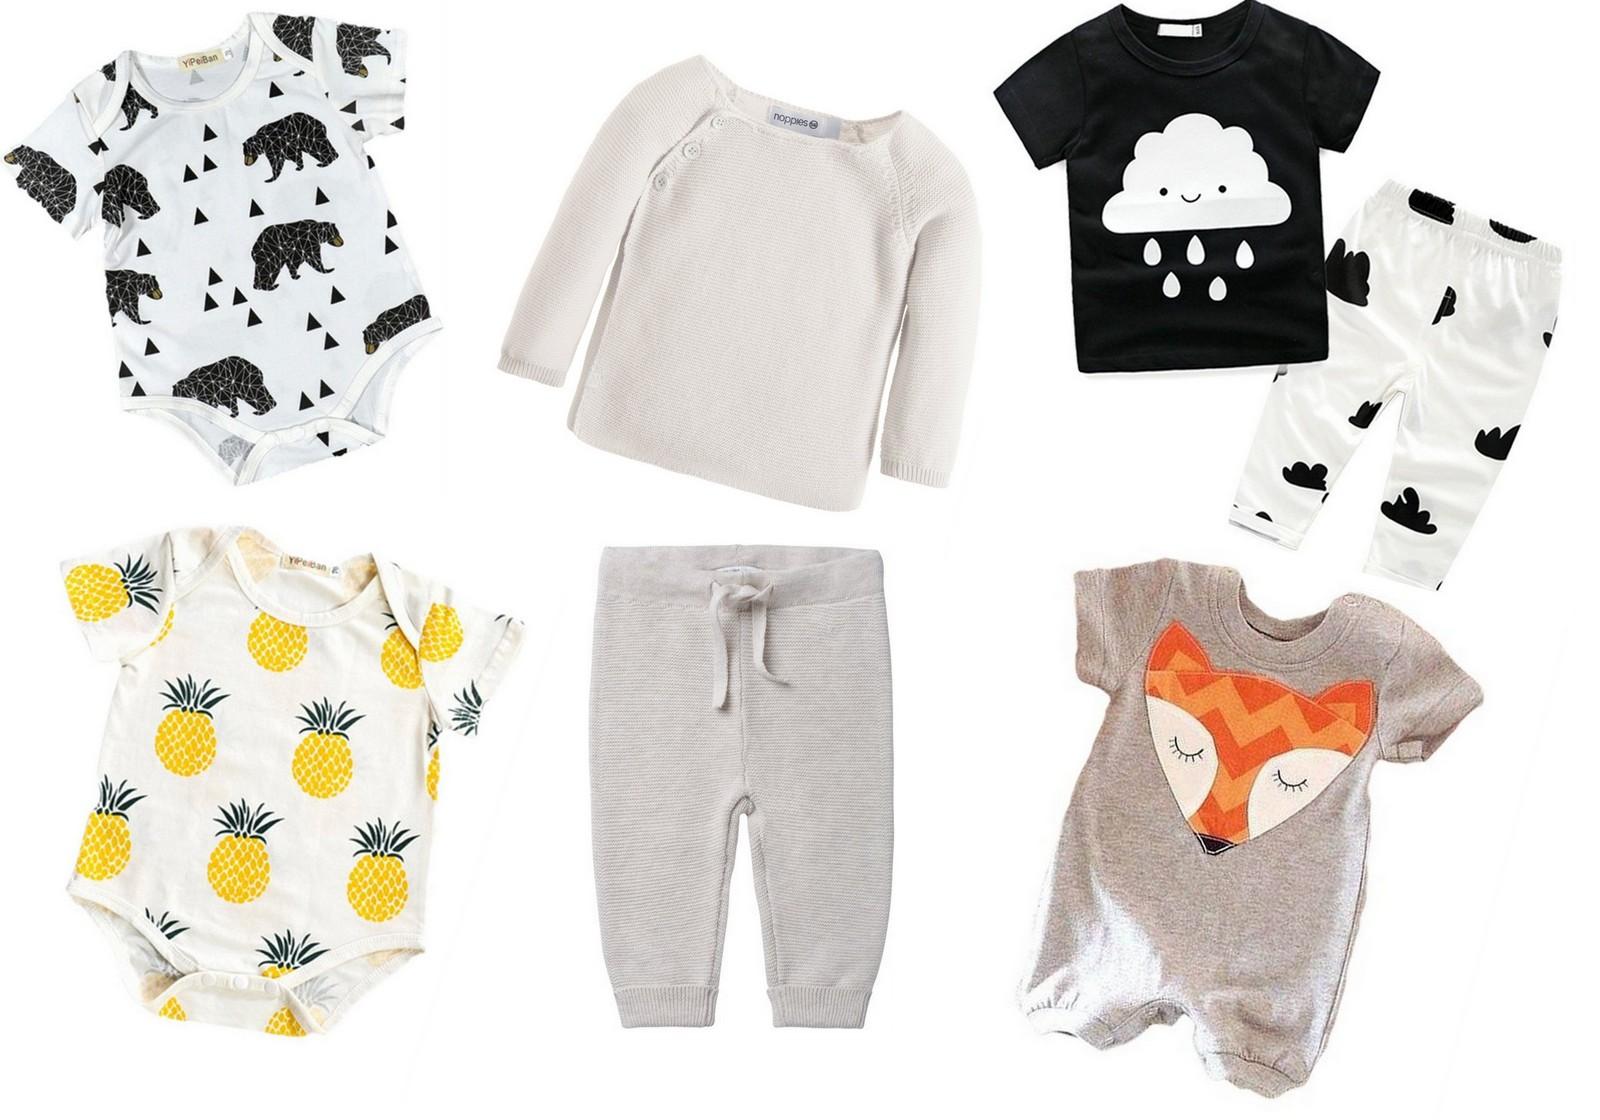 geschlechtsneutrale babykleidung jungen und m dchen shopping tipps. Black Bedroom Furniture Sets. Home Design Ideas